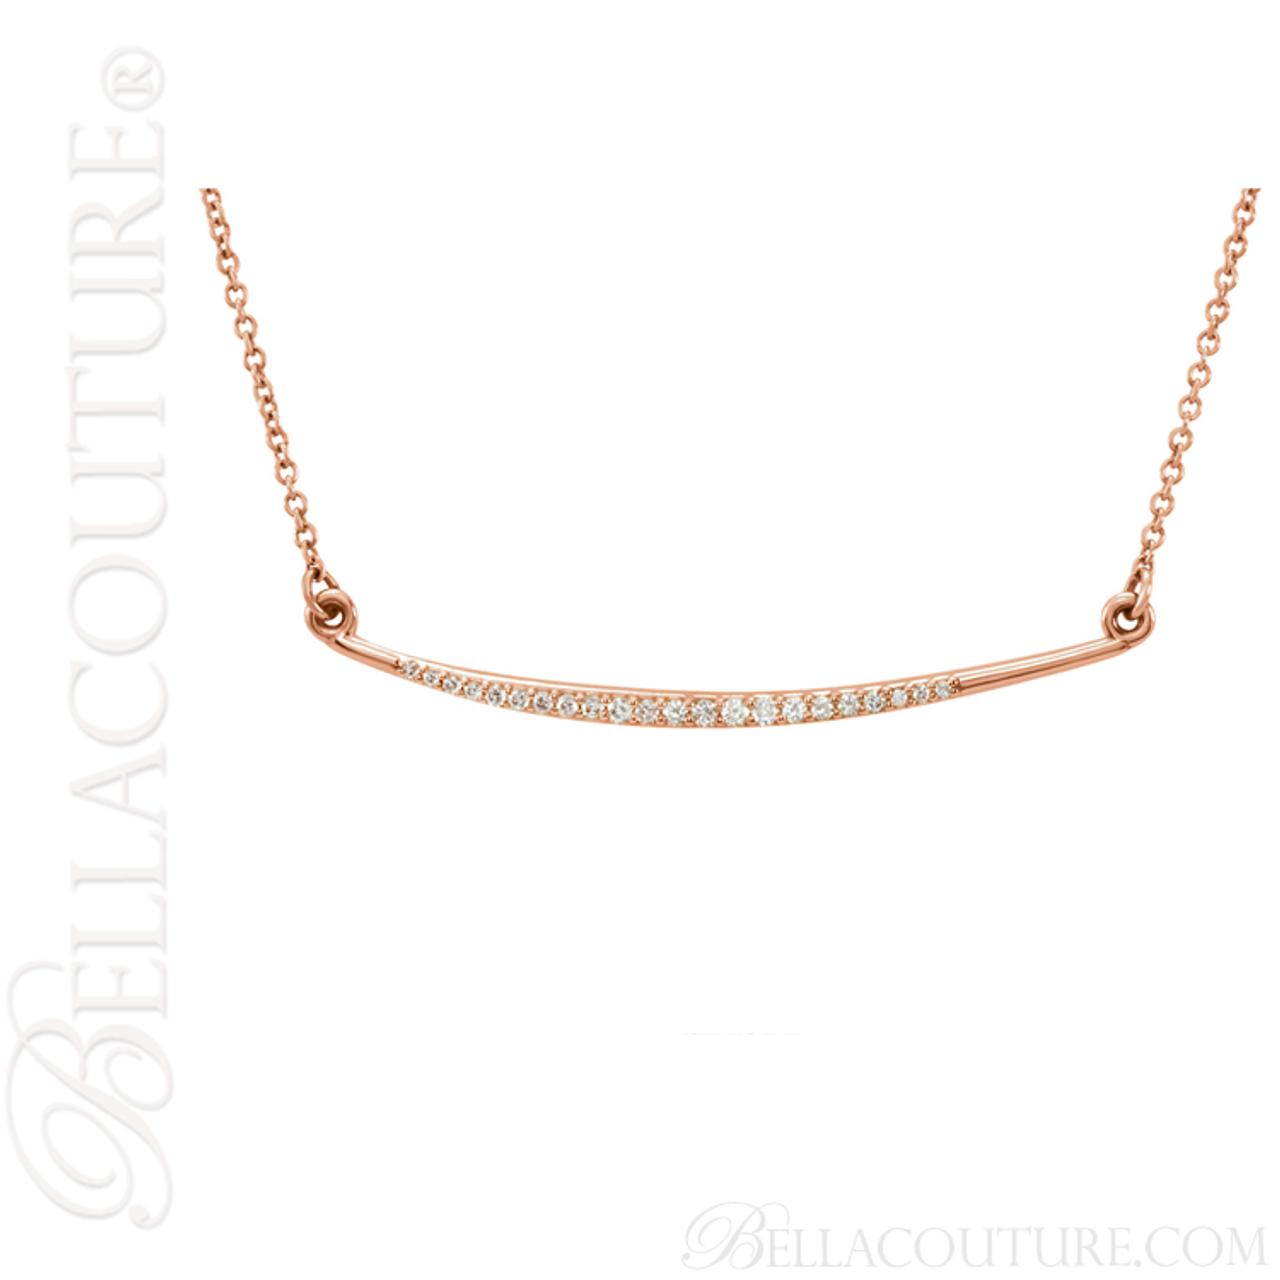 89254cf1c7594 (NEW) BELLA COUTURE Fine Delicate Diamond Curved Bar 14K Rose Gold Pendant  Necklace (16